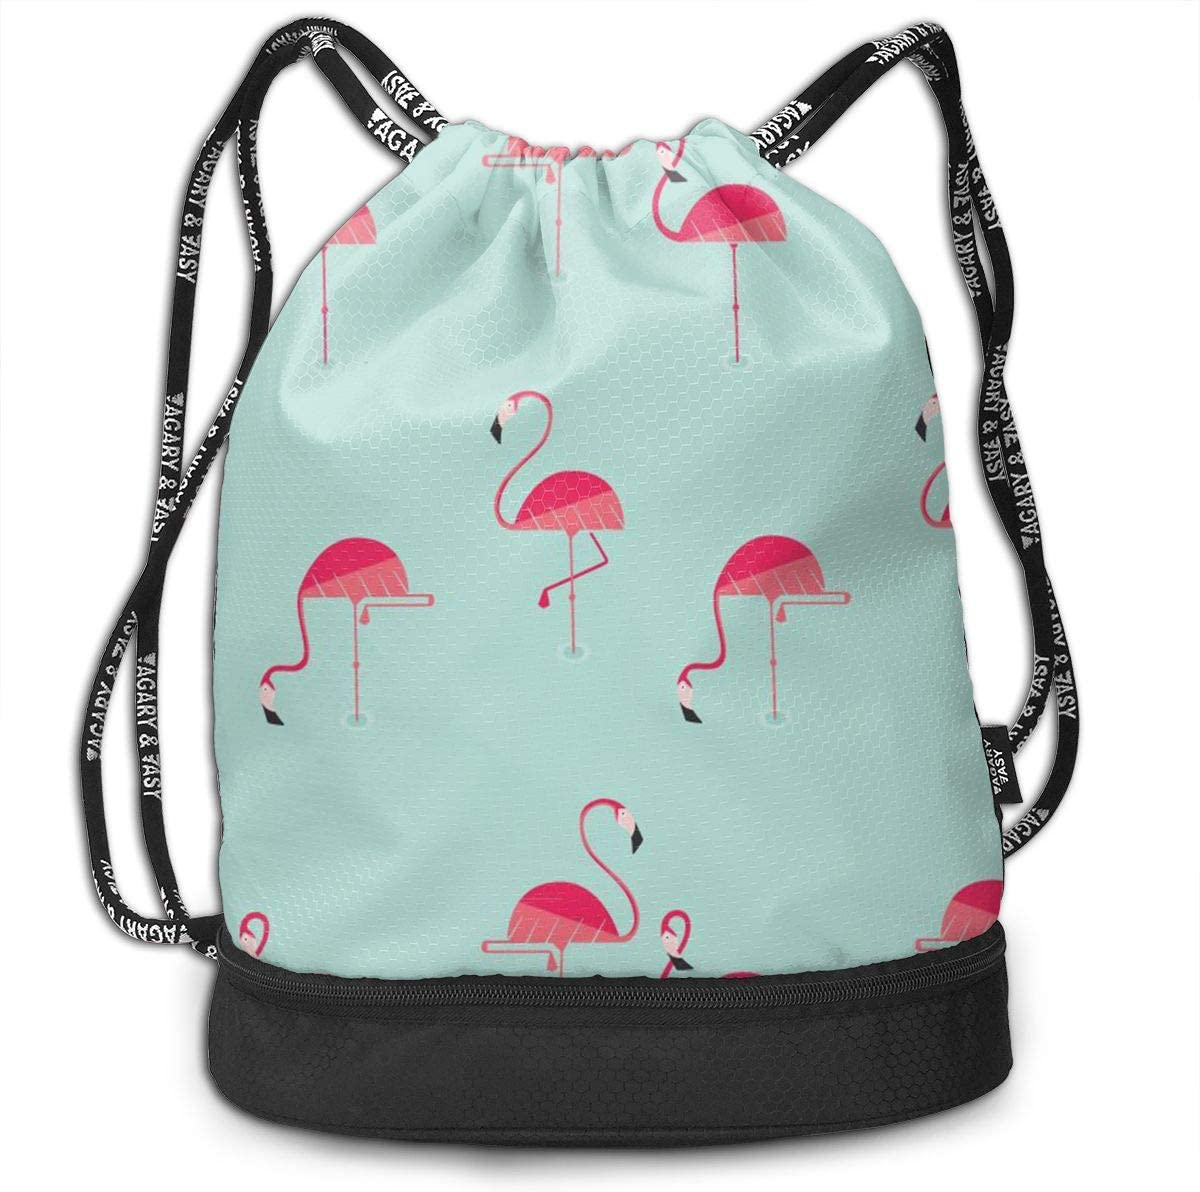 Zol1Q Lightweight Waterproof Large Storage Drawstring Bag for Men /& Women Flamingo Cinch Backpack Sackpack Tote Sack